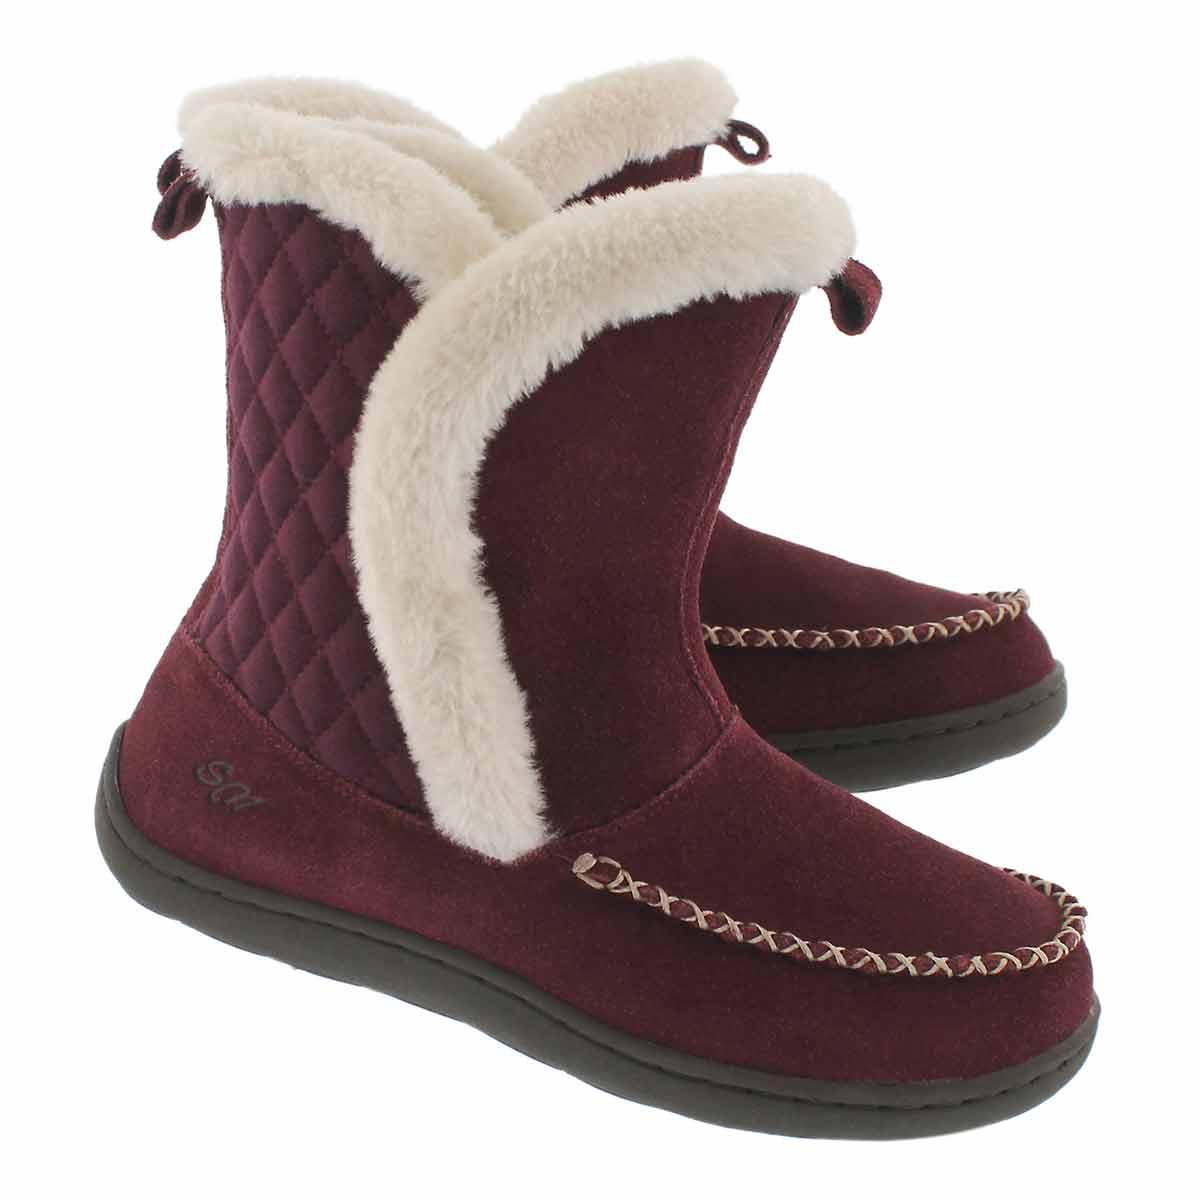 Lds Phoebe Hi burg suede slipper bootie